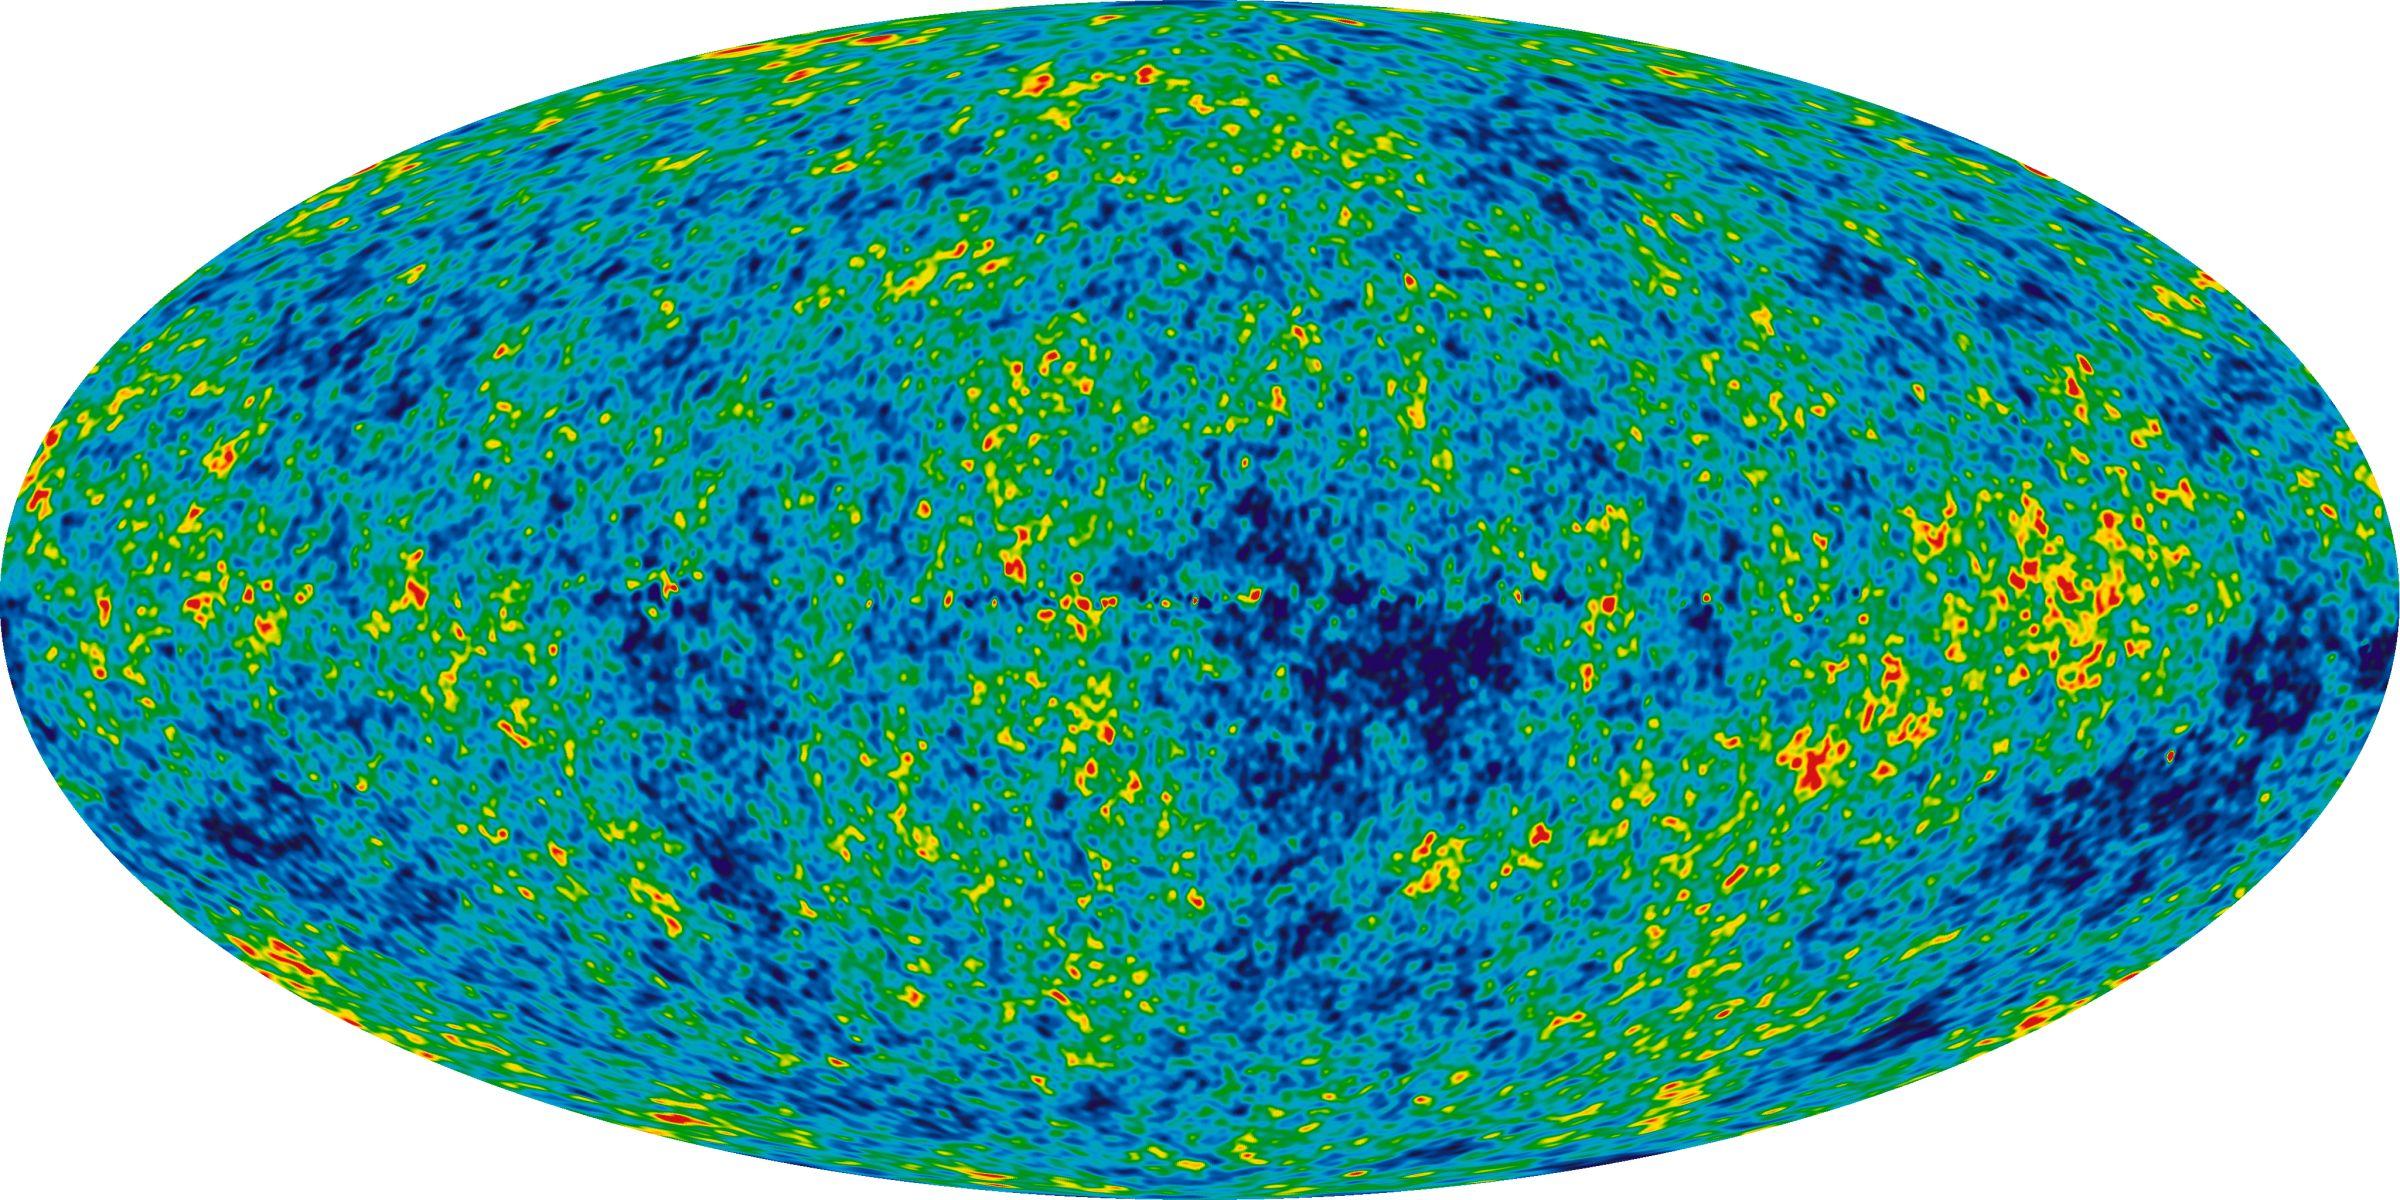 microwave background radiation